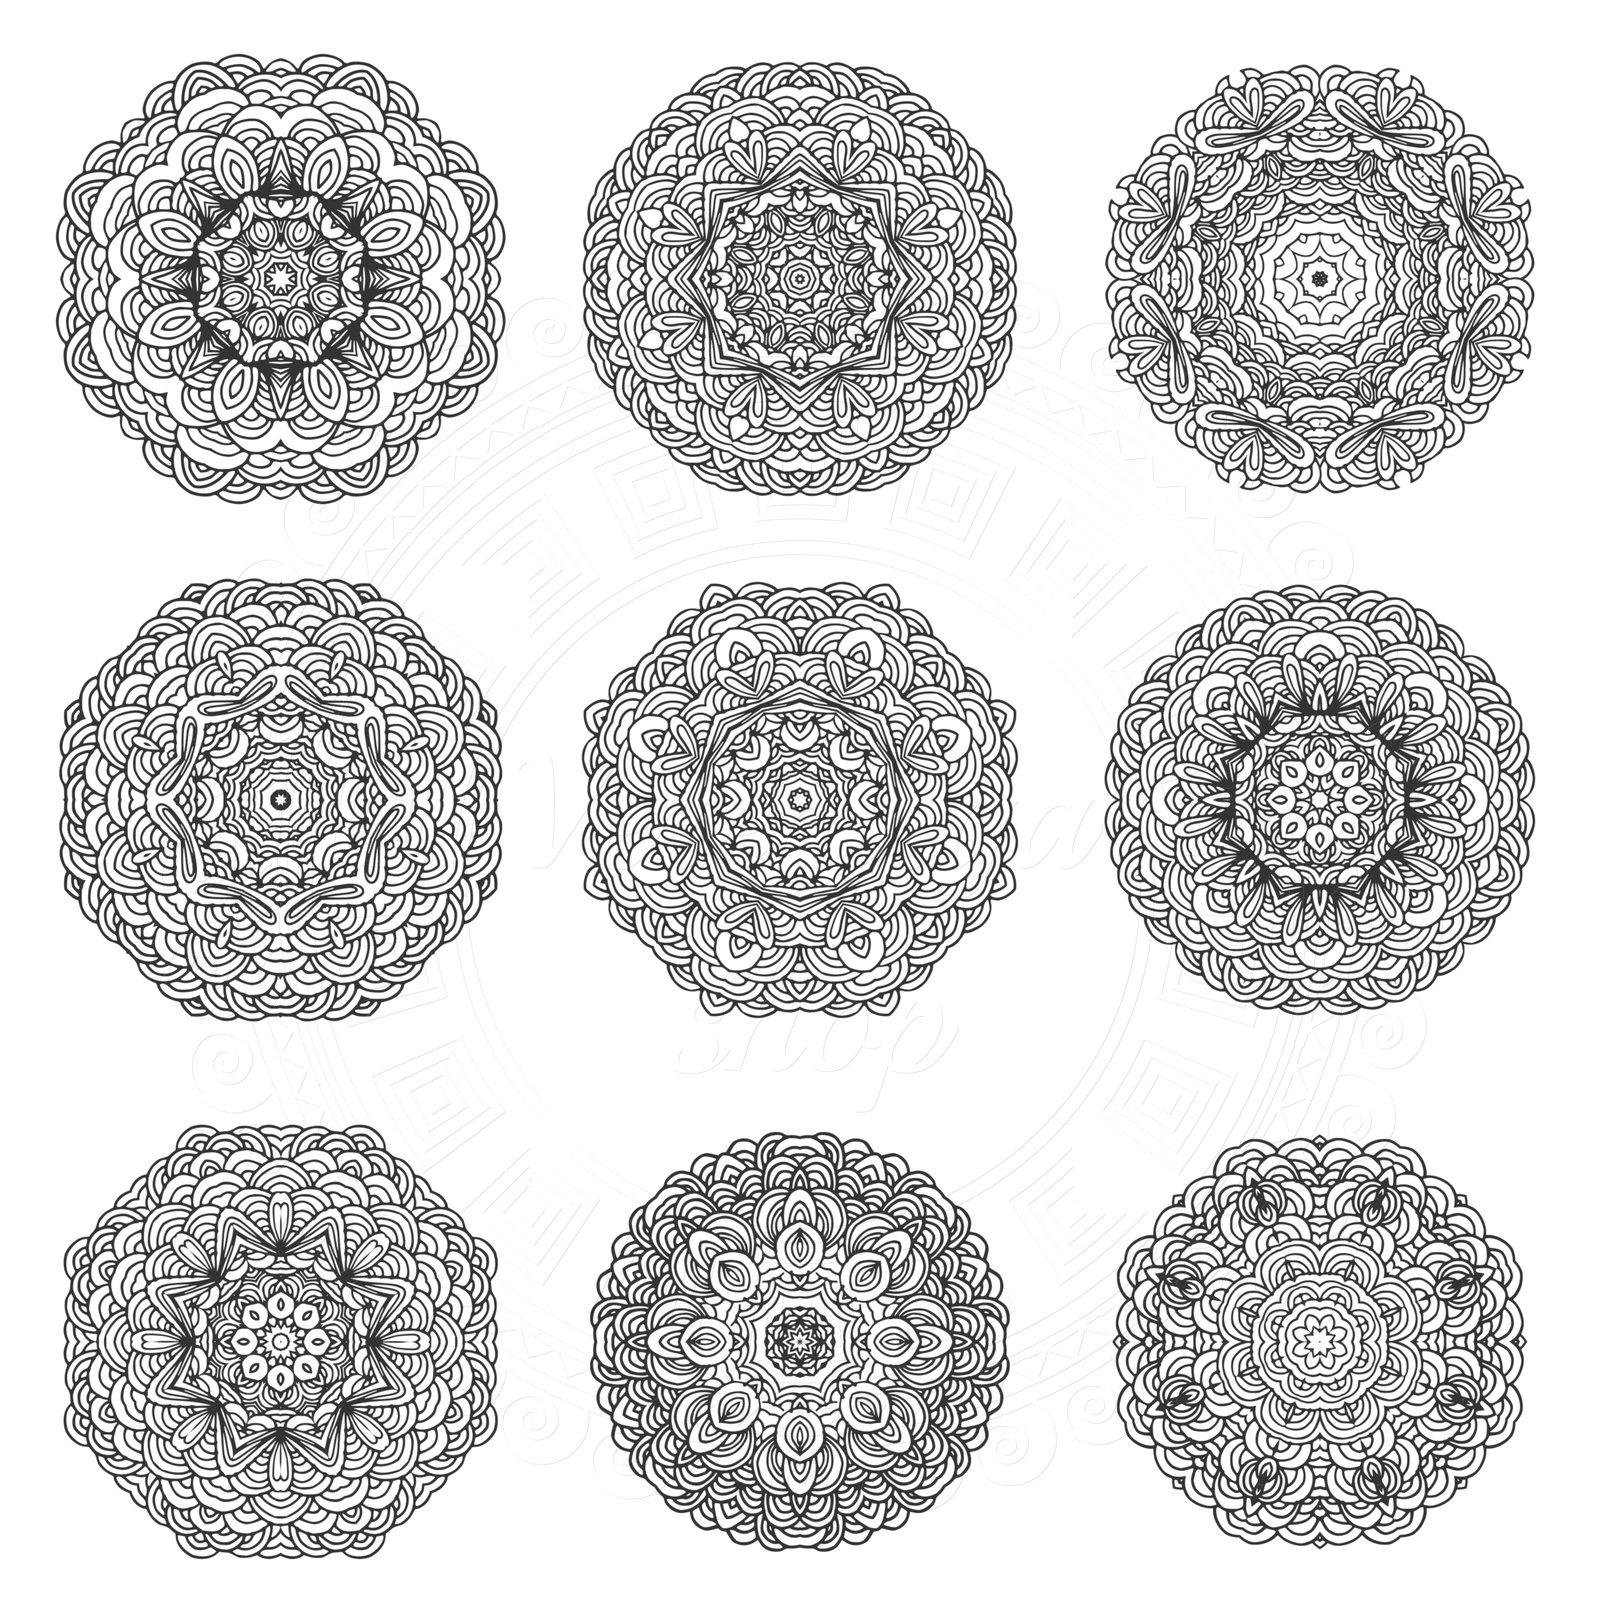 Hand-drawn mandalas set